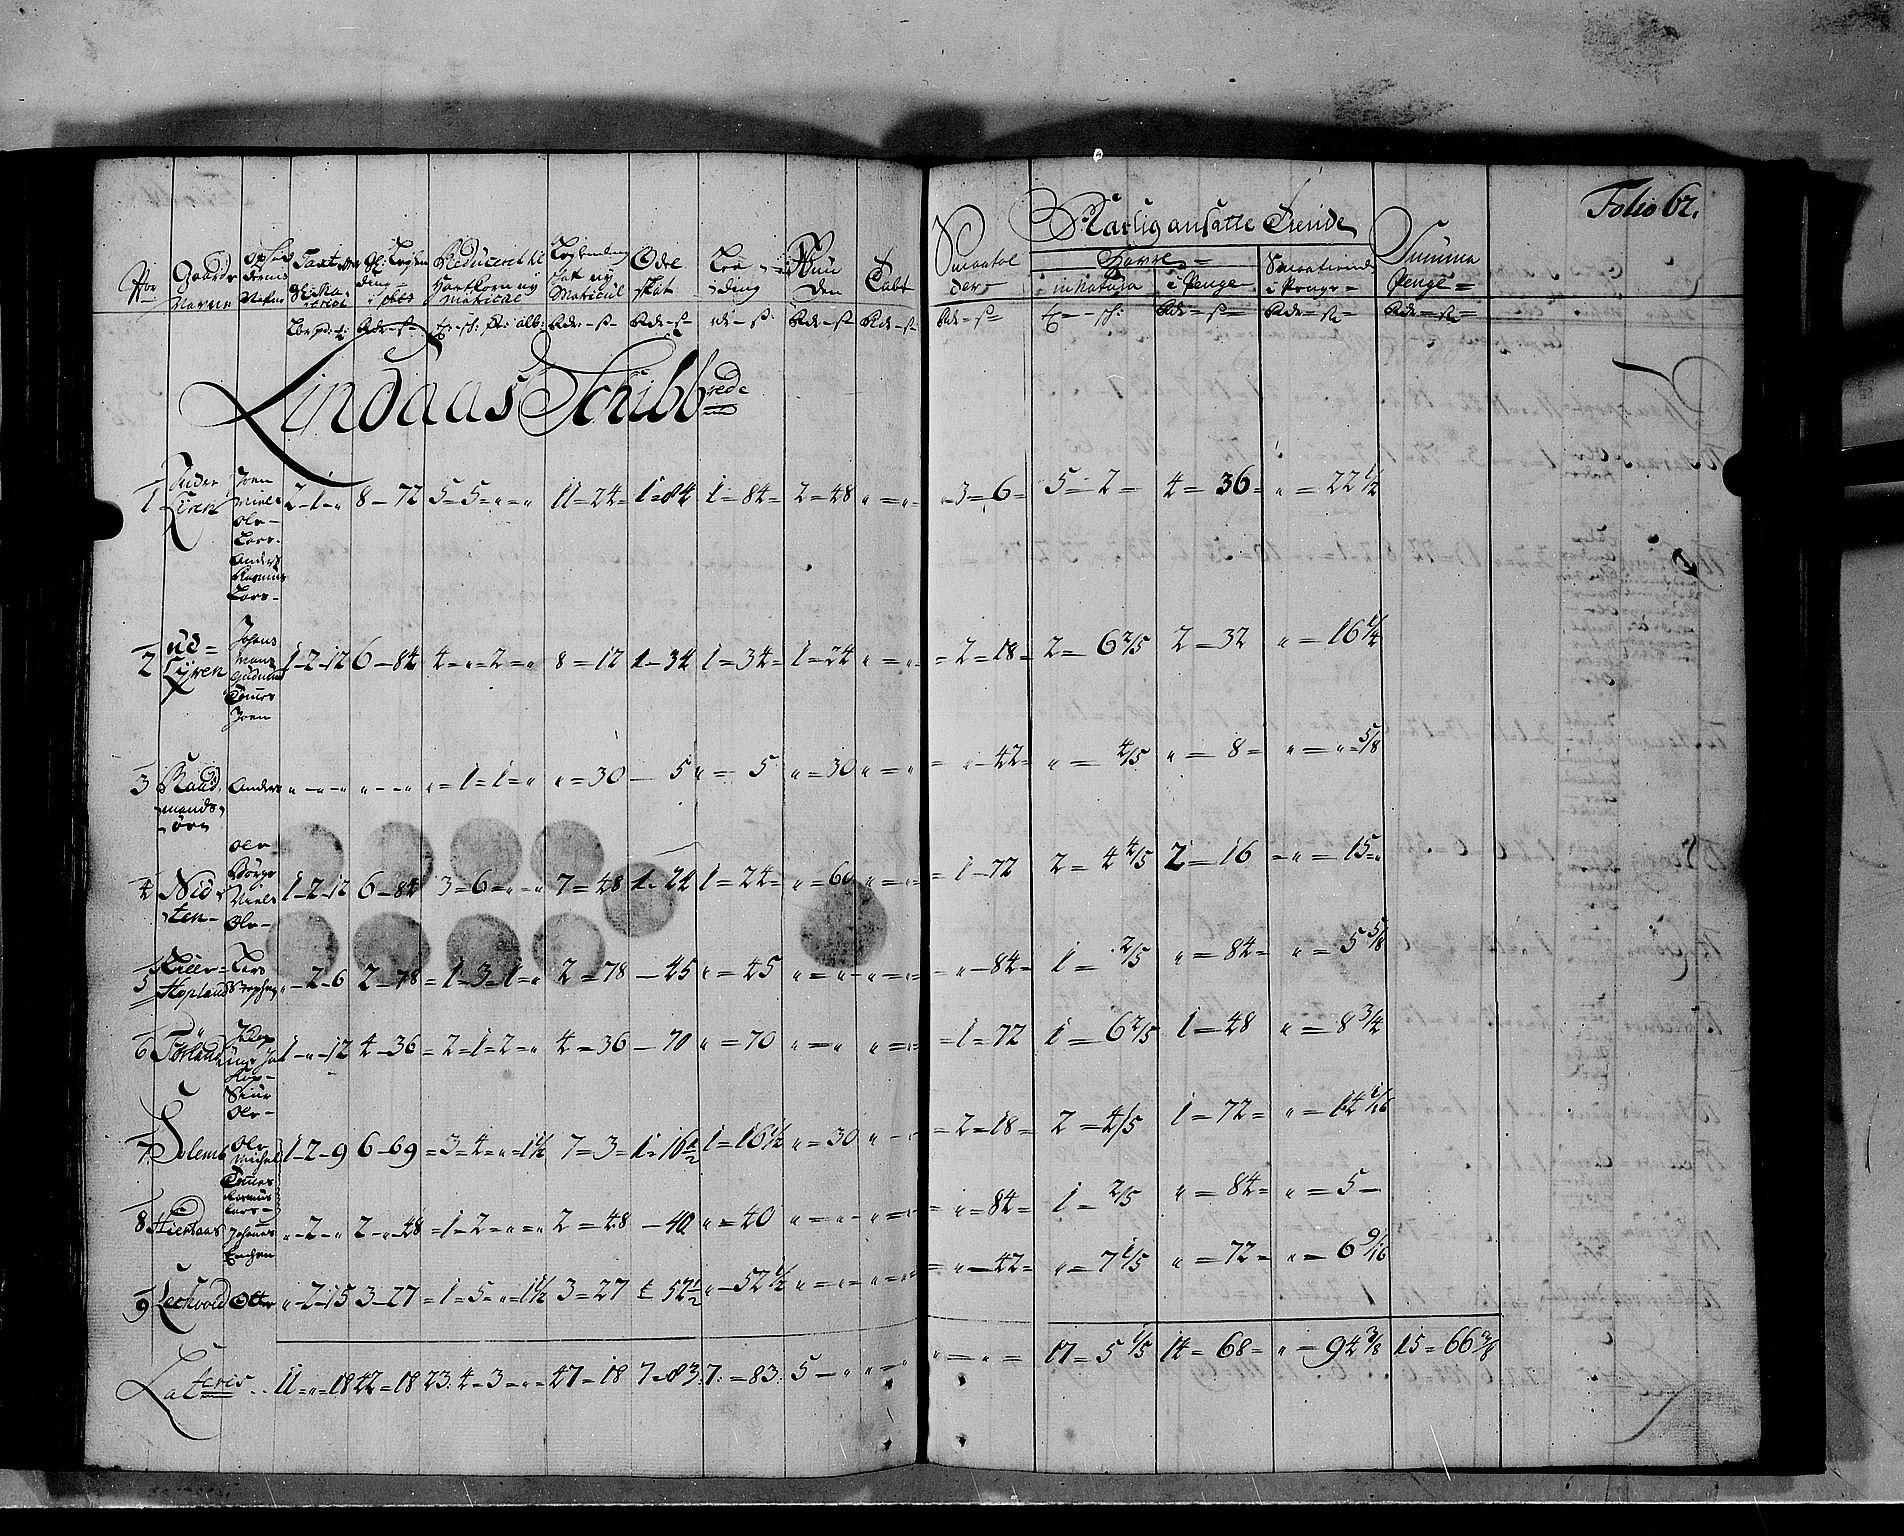 RA, Rentekammeret inntil 1814, Realistisk ordnet avdeling, N/Nb/Nbf/L0140: Nordhordland matrikkelprotokoll, 1723, s. 61b-62a